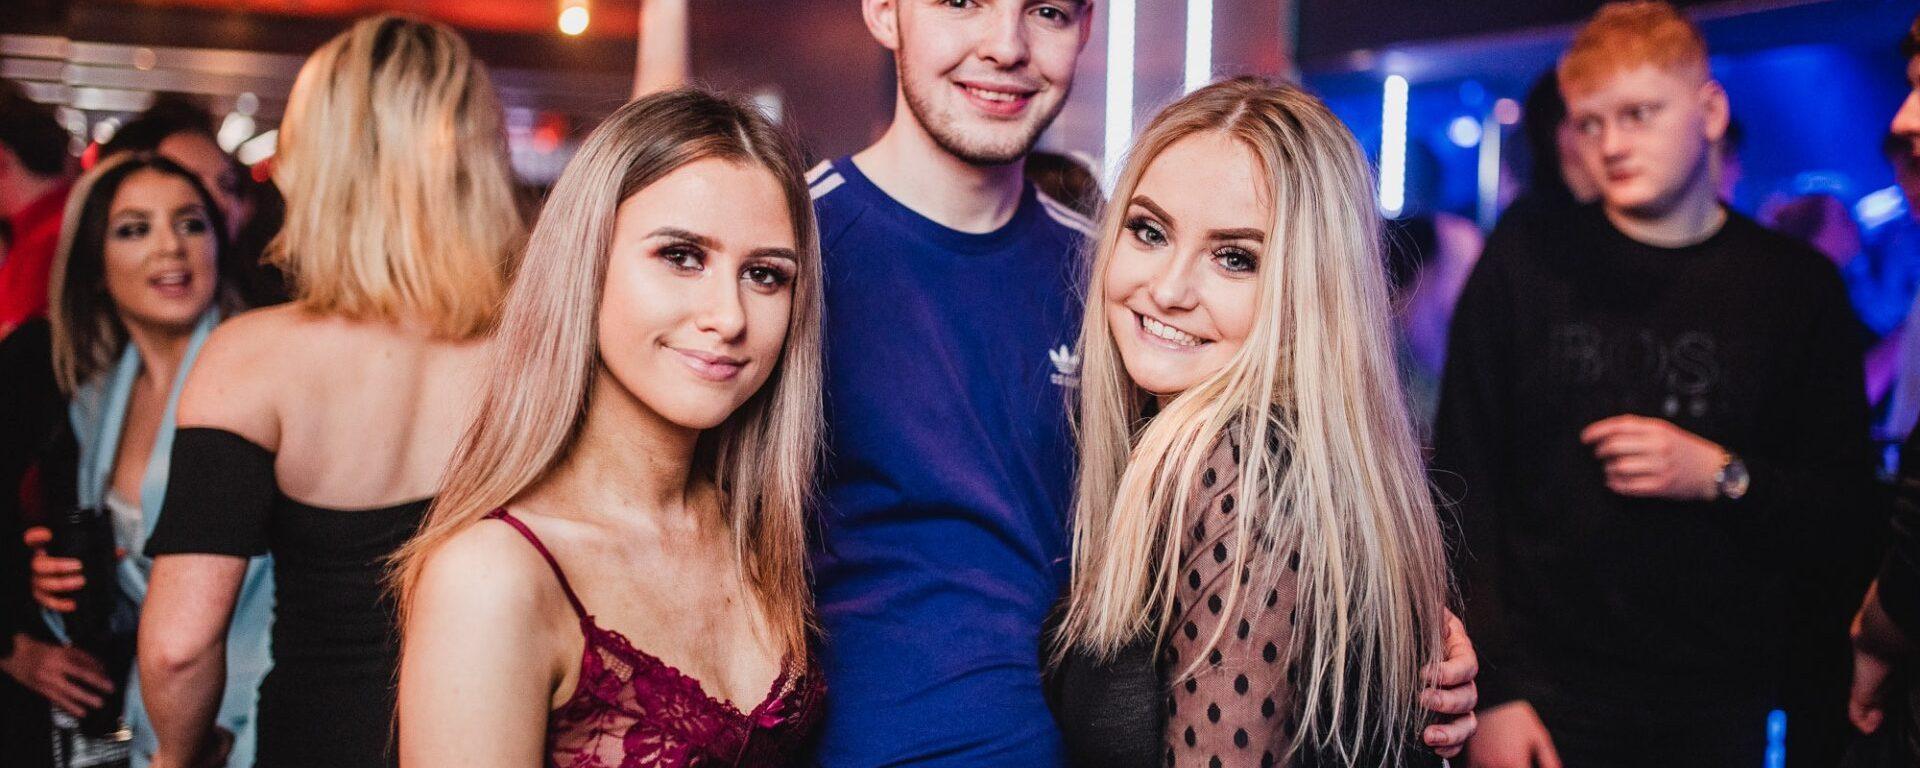 Student nights in Edinburgh